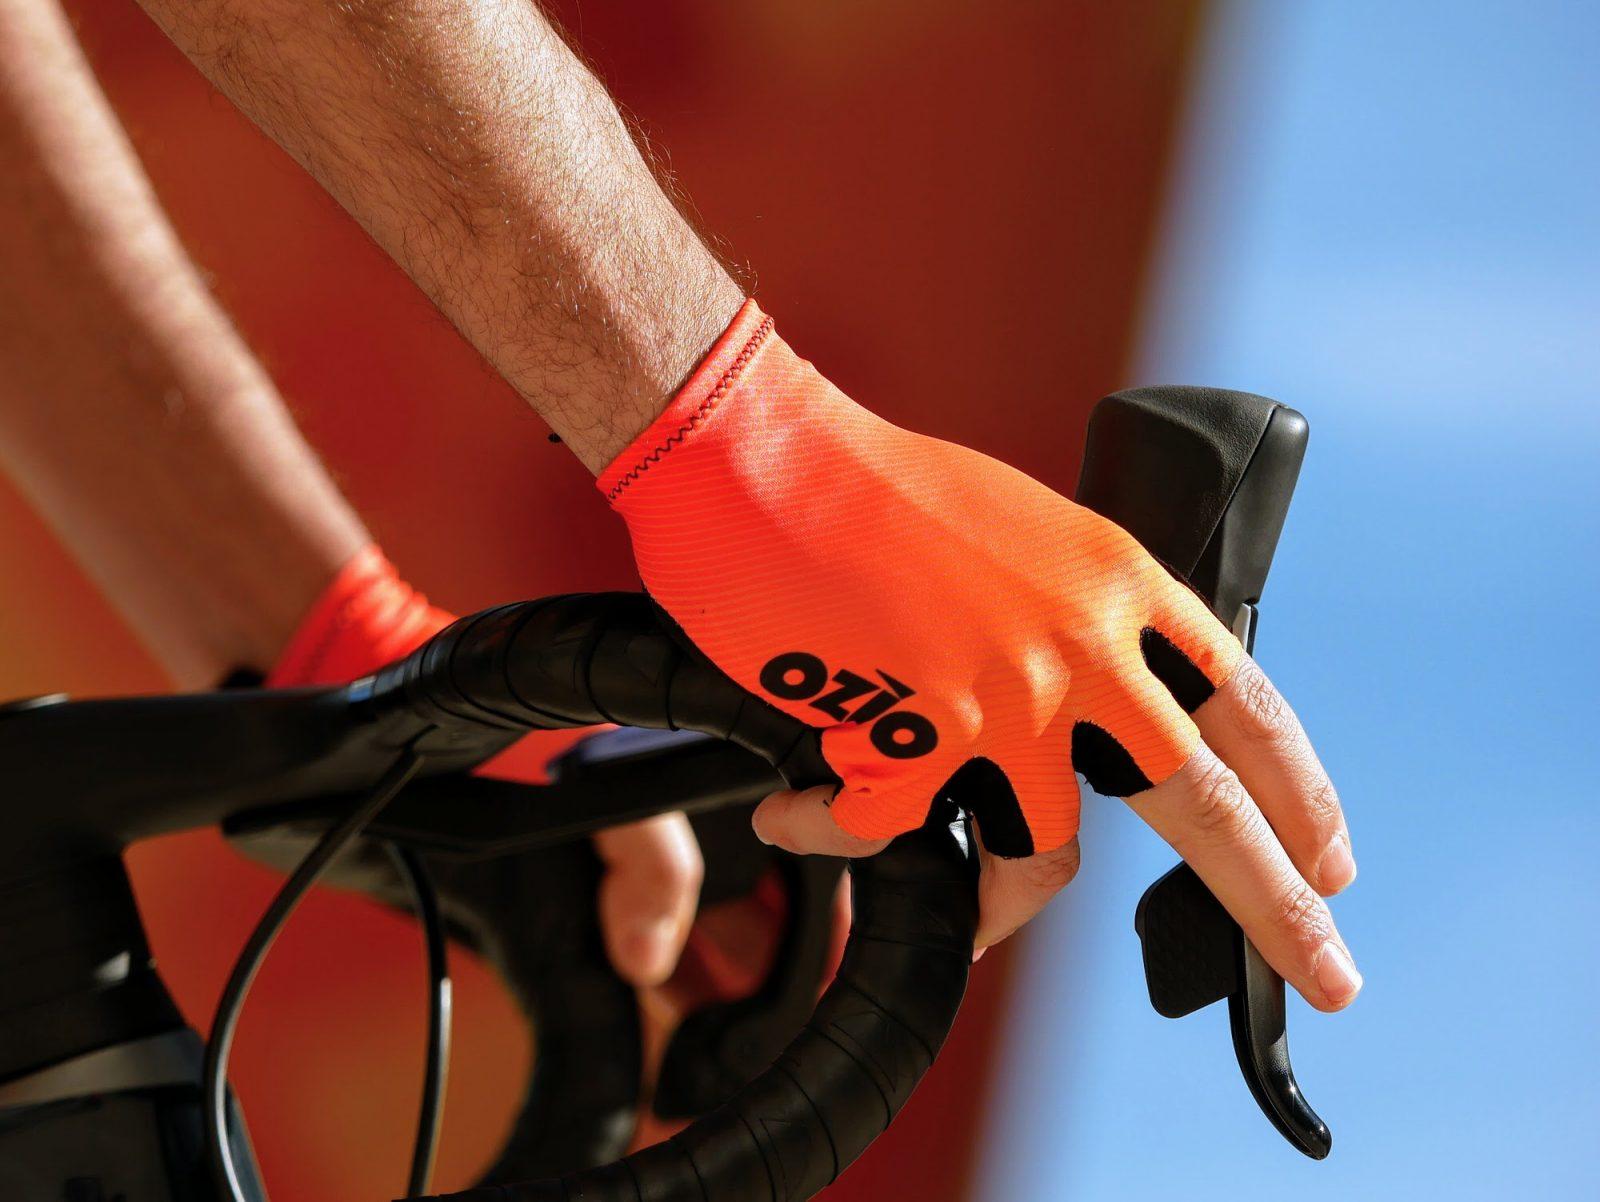 Mitaines de vélo oranges OZIO